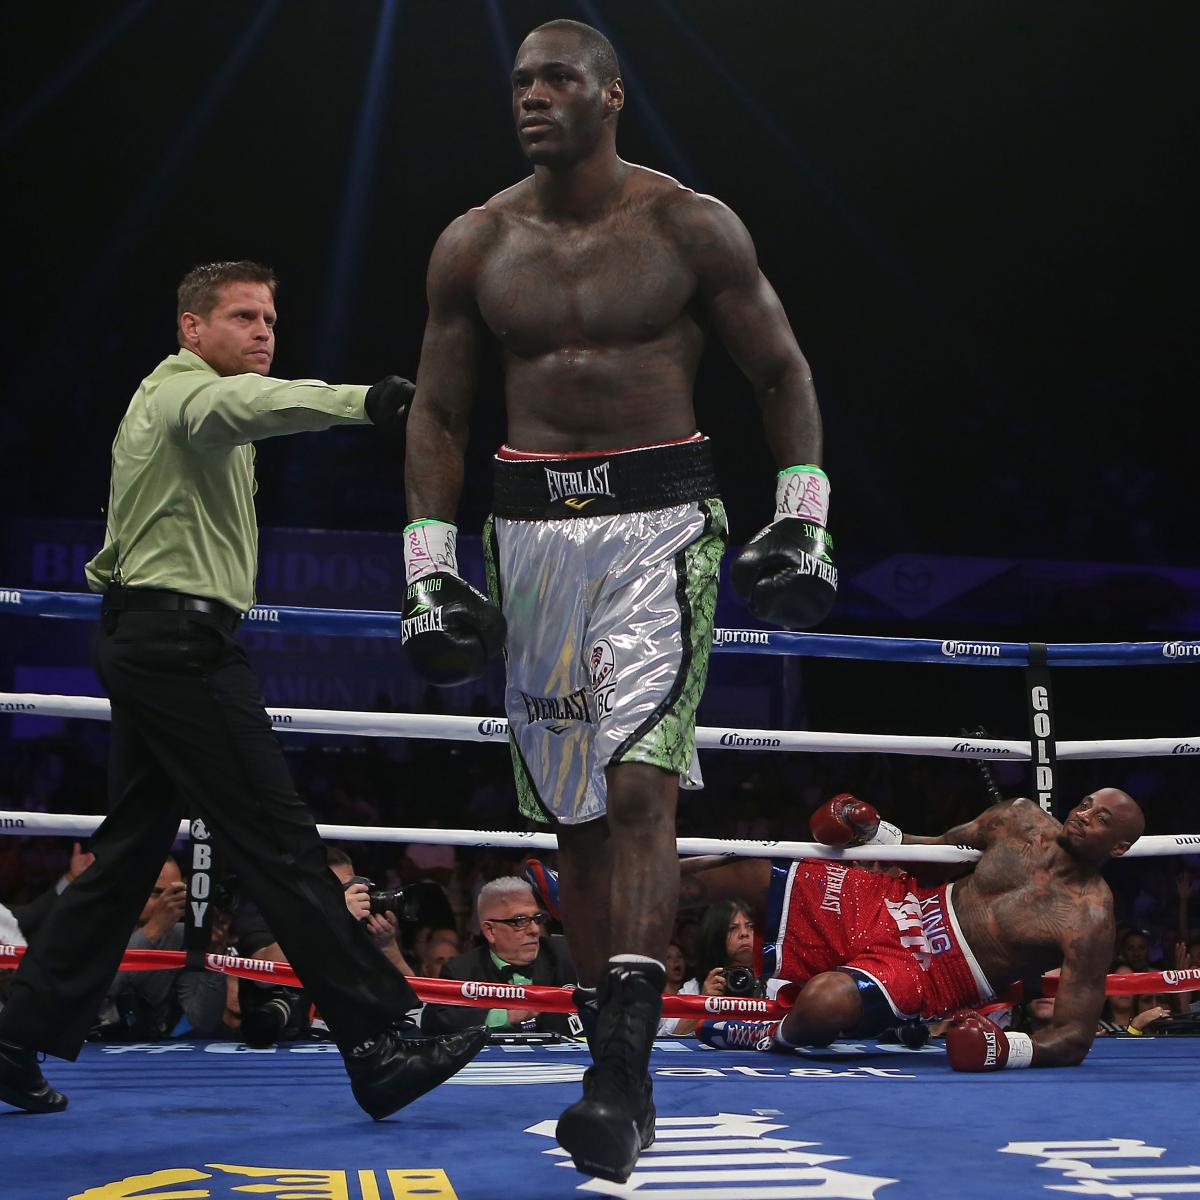 Heavyweight Boxer Deontay Wilder Serves Up Internet Troll